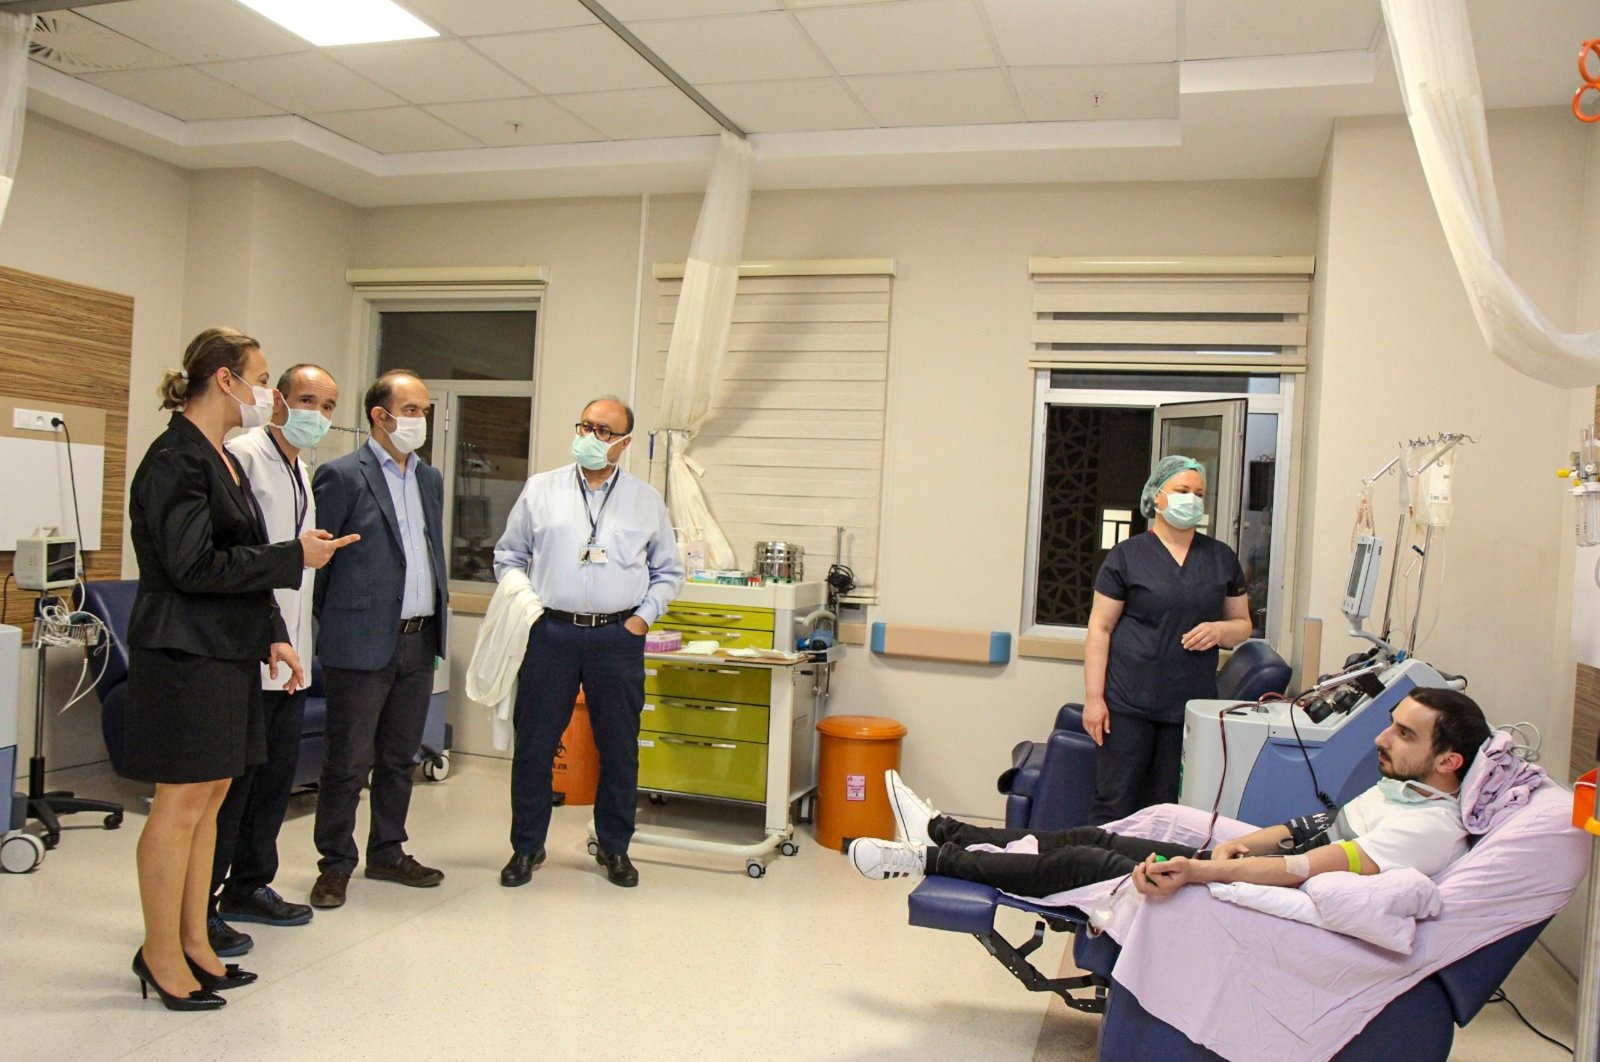 Çağlar Çolak donates plasma for a patient recovering from COVID-19, in Antalya, Turkey, Friday, April 10, 2020. (DHA Photo)